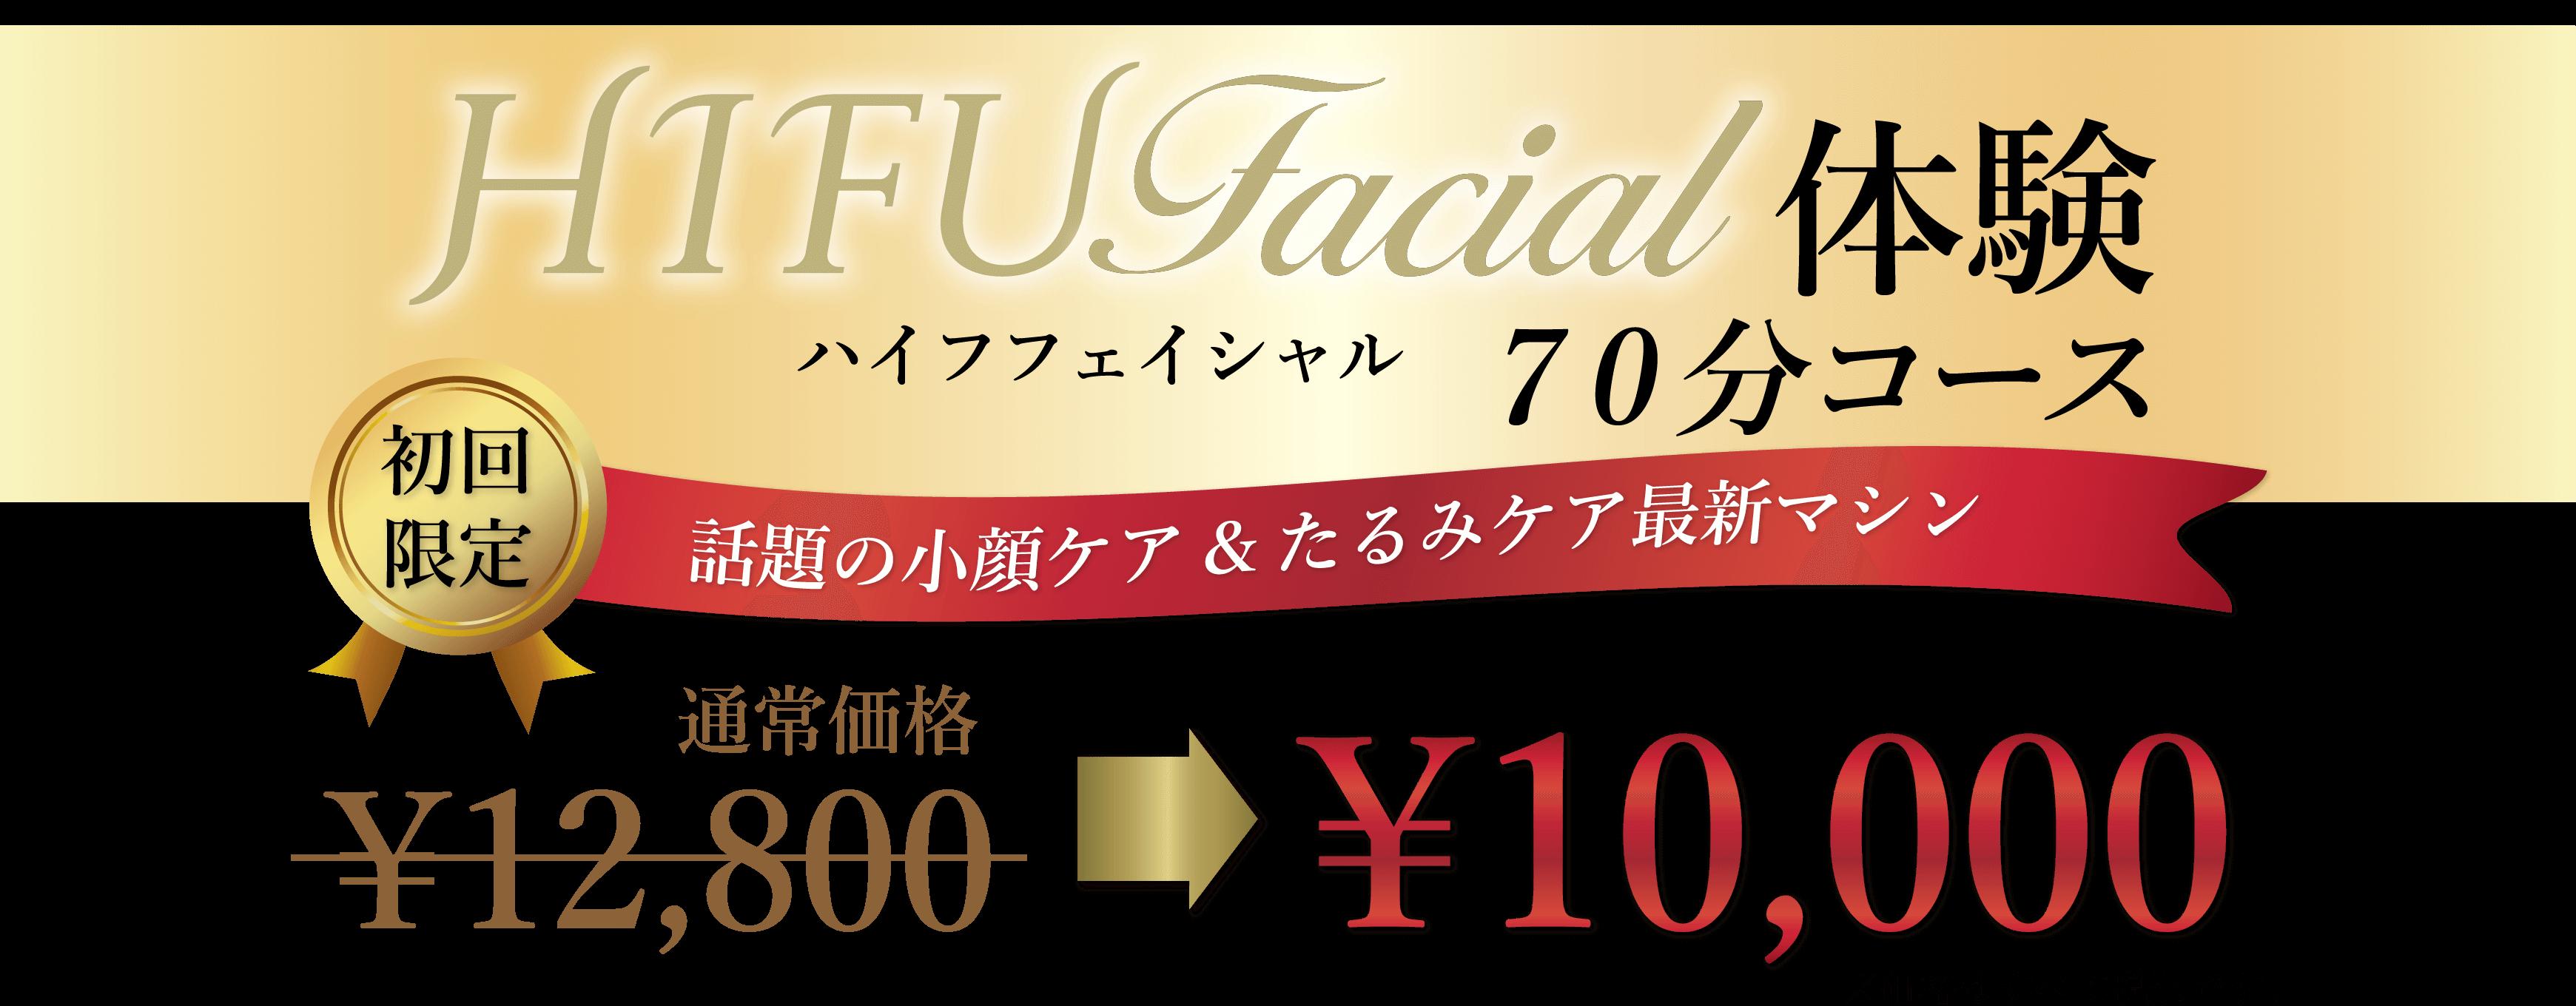 HIFU(ハイフ)facial(フェイシャル)体験70分コース。初回限定!話題の小顔ケア&たるみケア最新マシン。通常価格12800円を今なら10000円